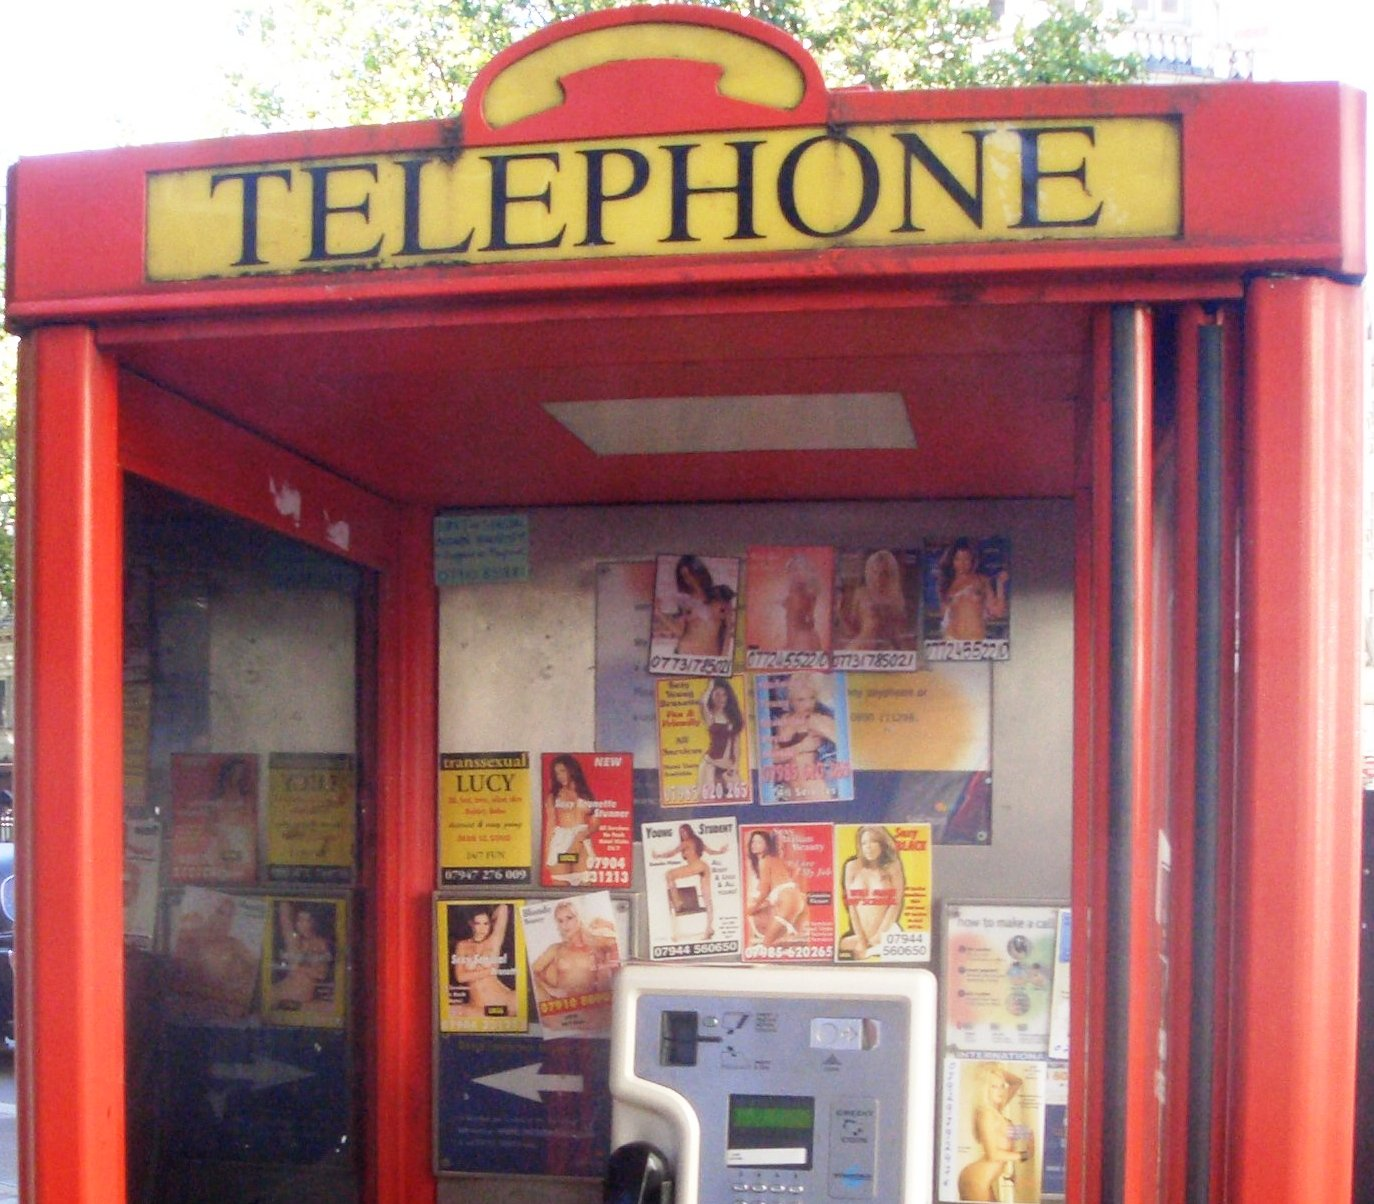 filephone box prostitute calling cards 1 cropjpg - Phone Calling Cards